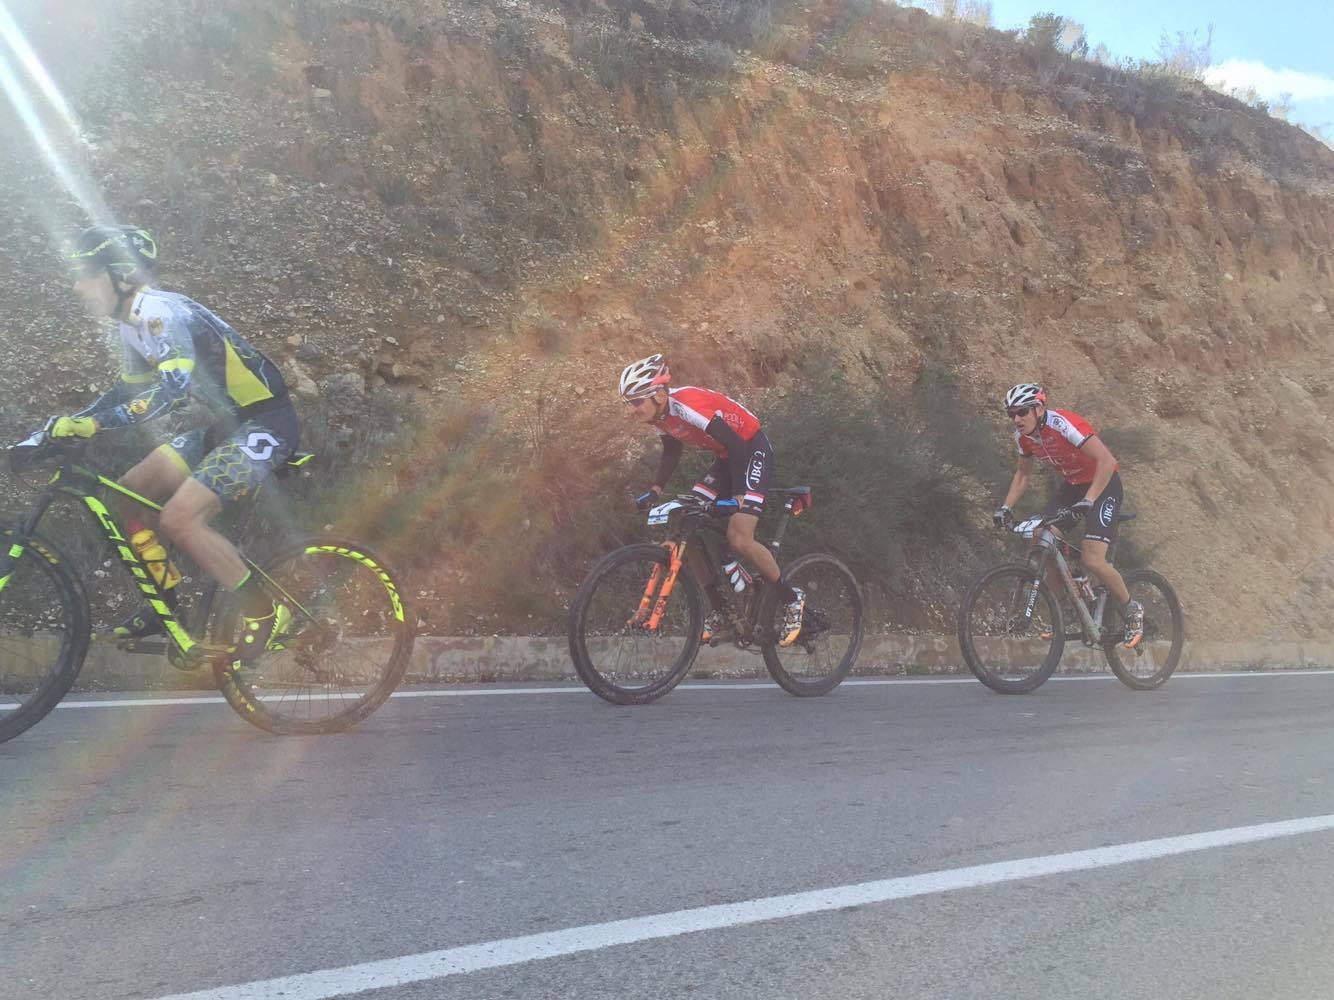 JBG2 Team – Costa Blanca Bike Race, Etap I